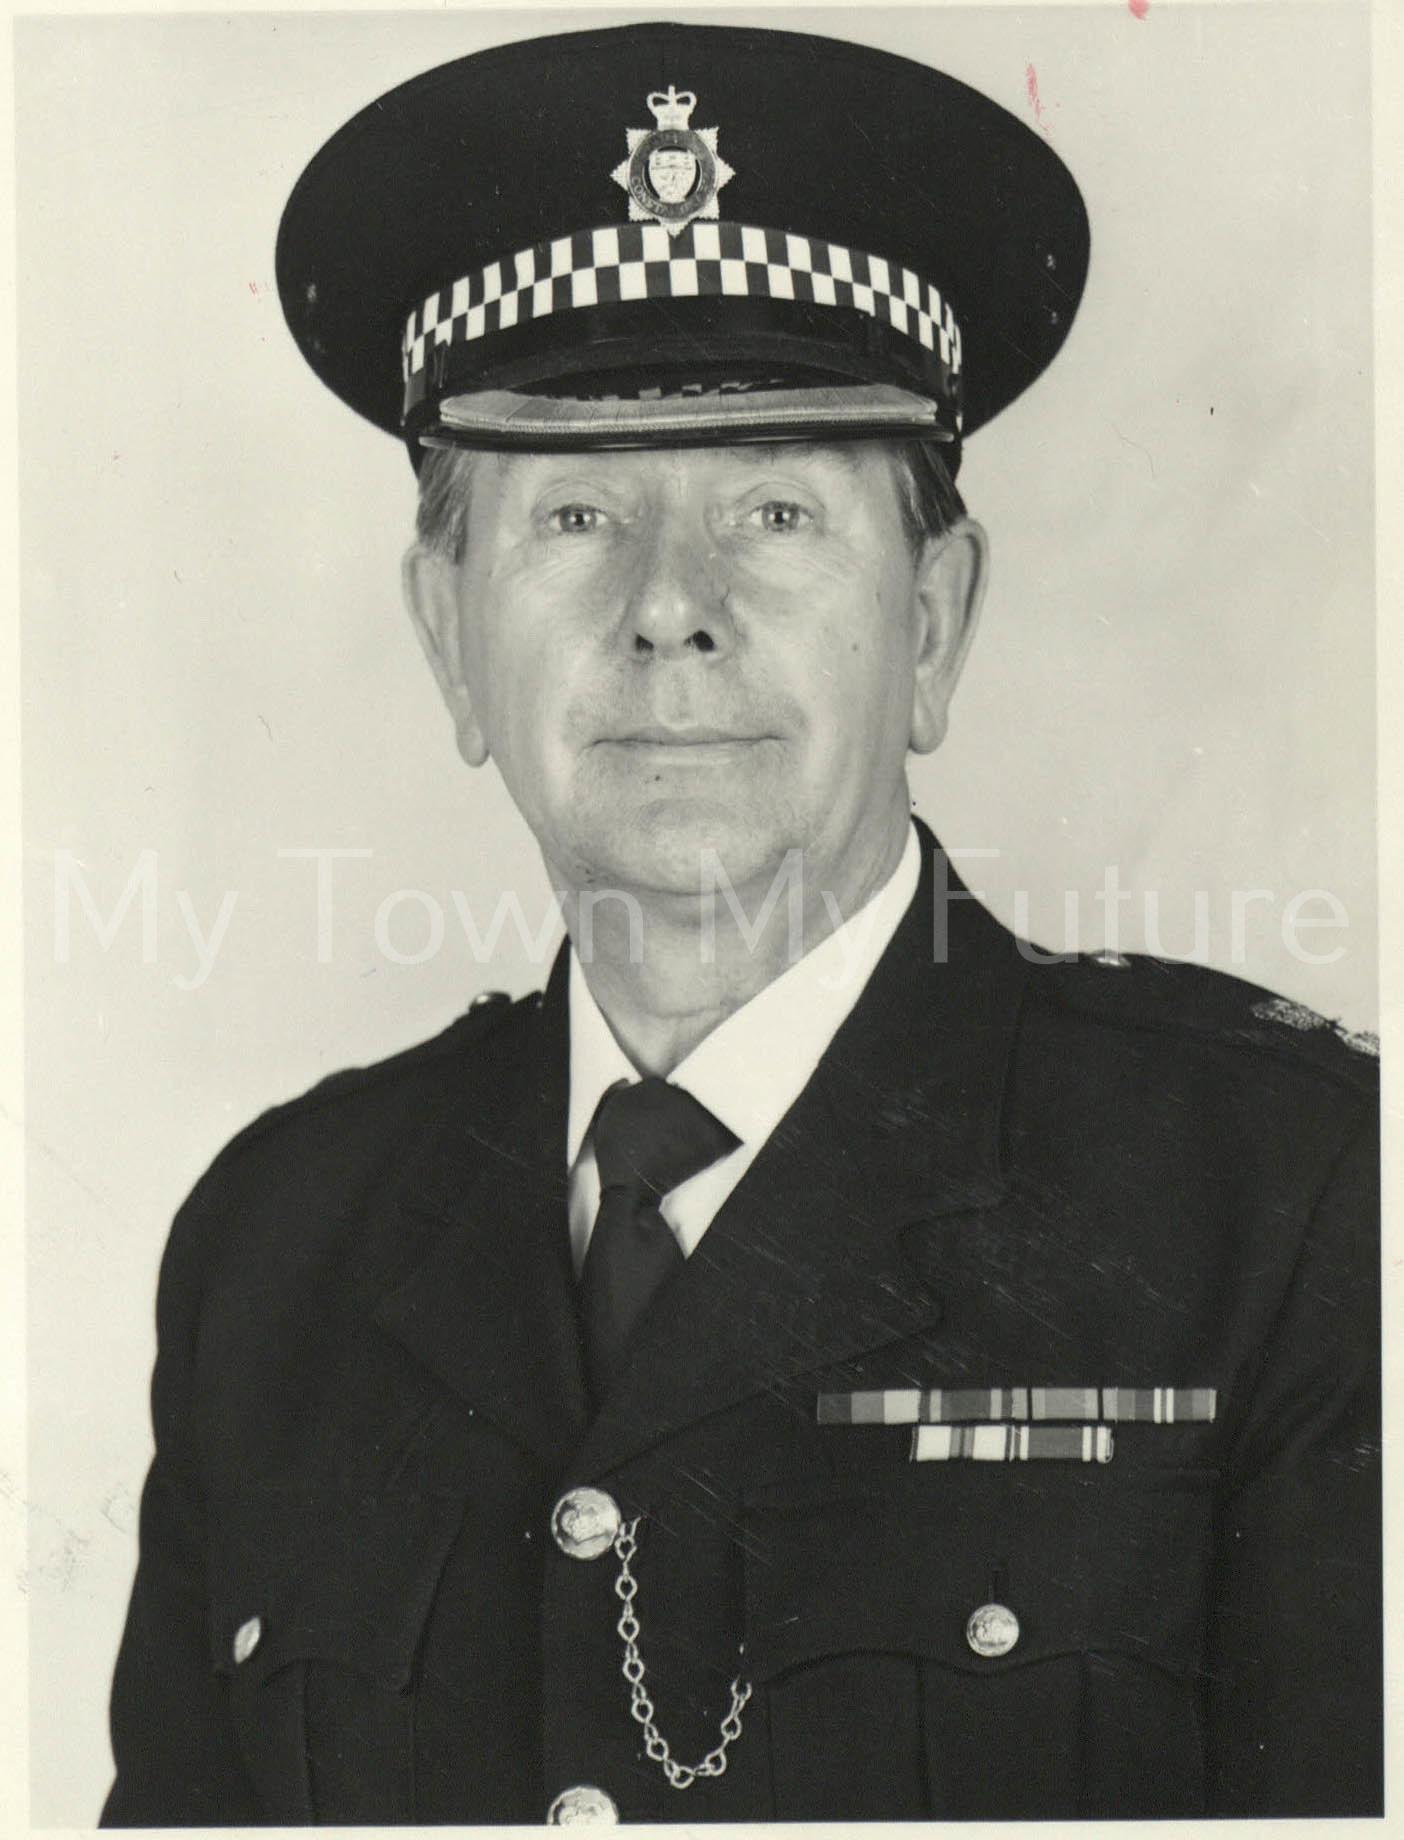 Police Chief Reg Spriggs